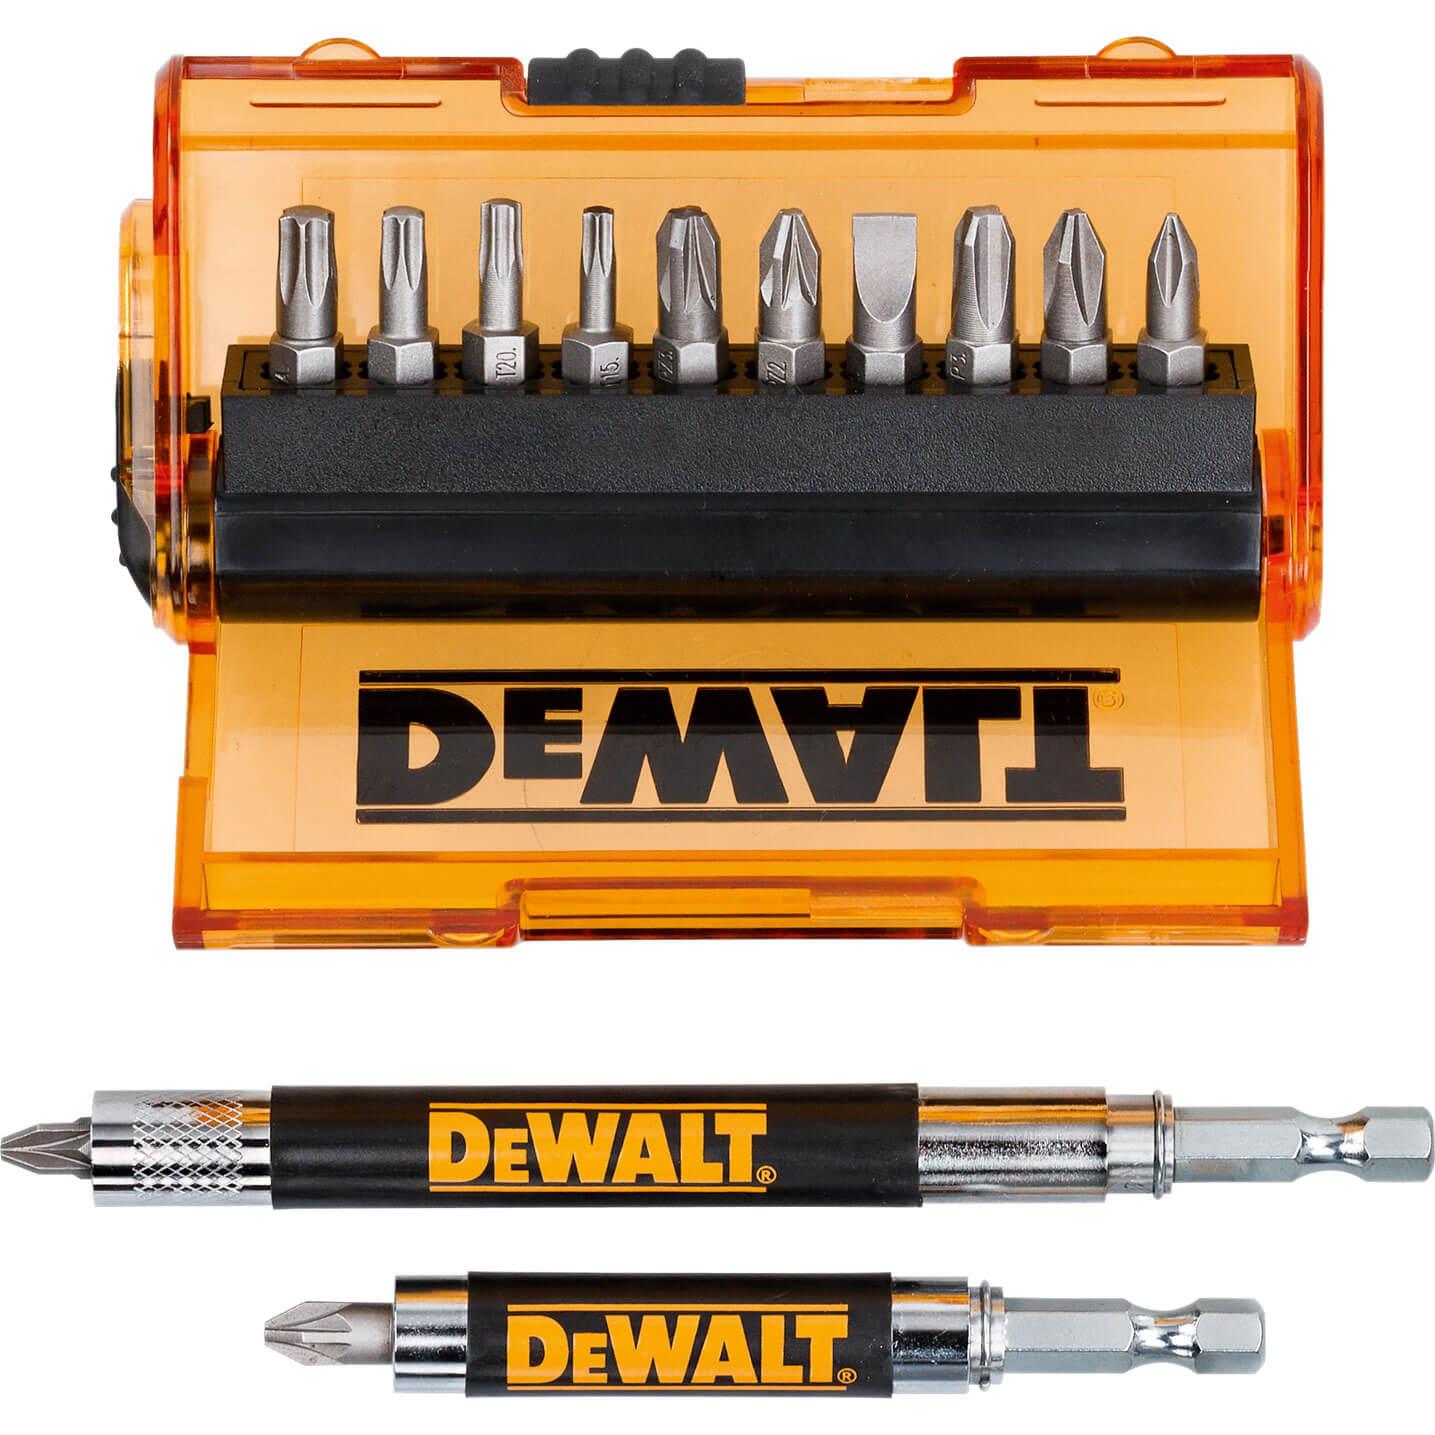 DeWalt 14 Piece Screwdriver Bit Set Pozi / Phillips / Slotted / Torx